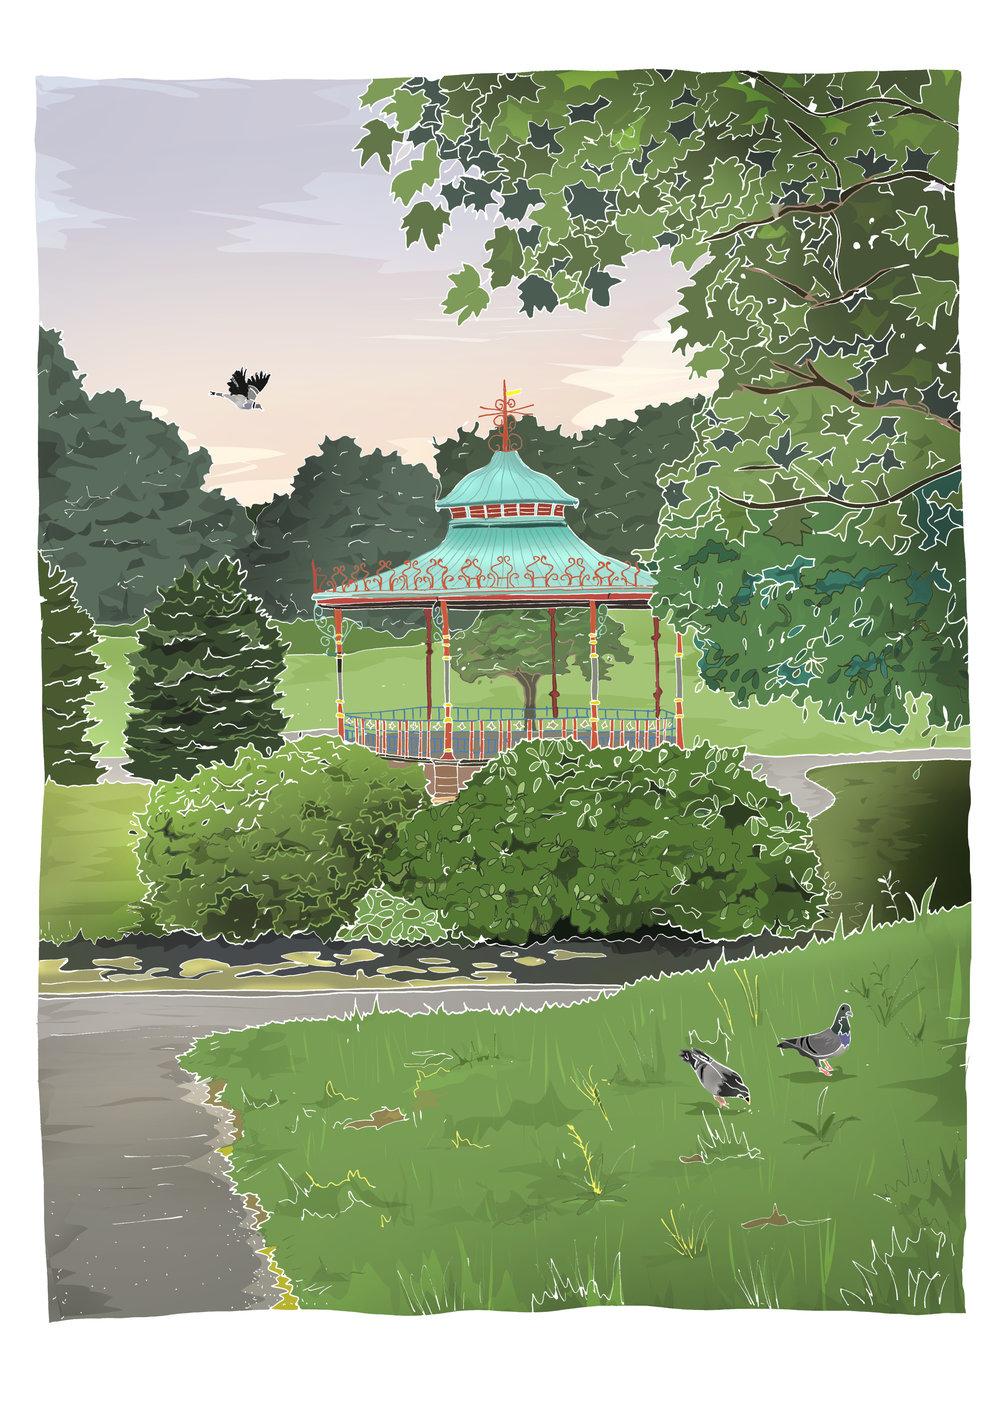 Sefton Park Pagoda